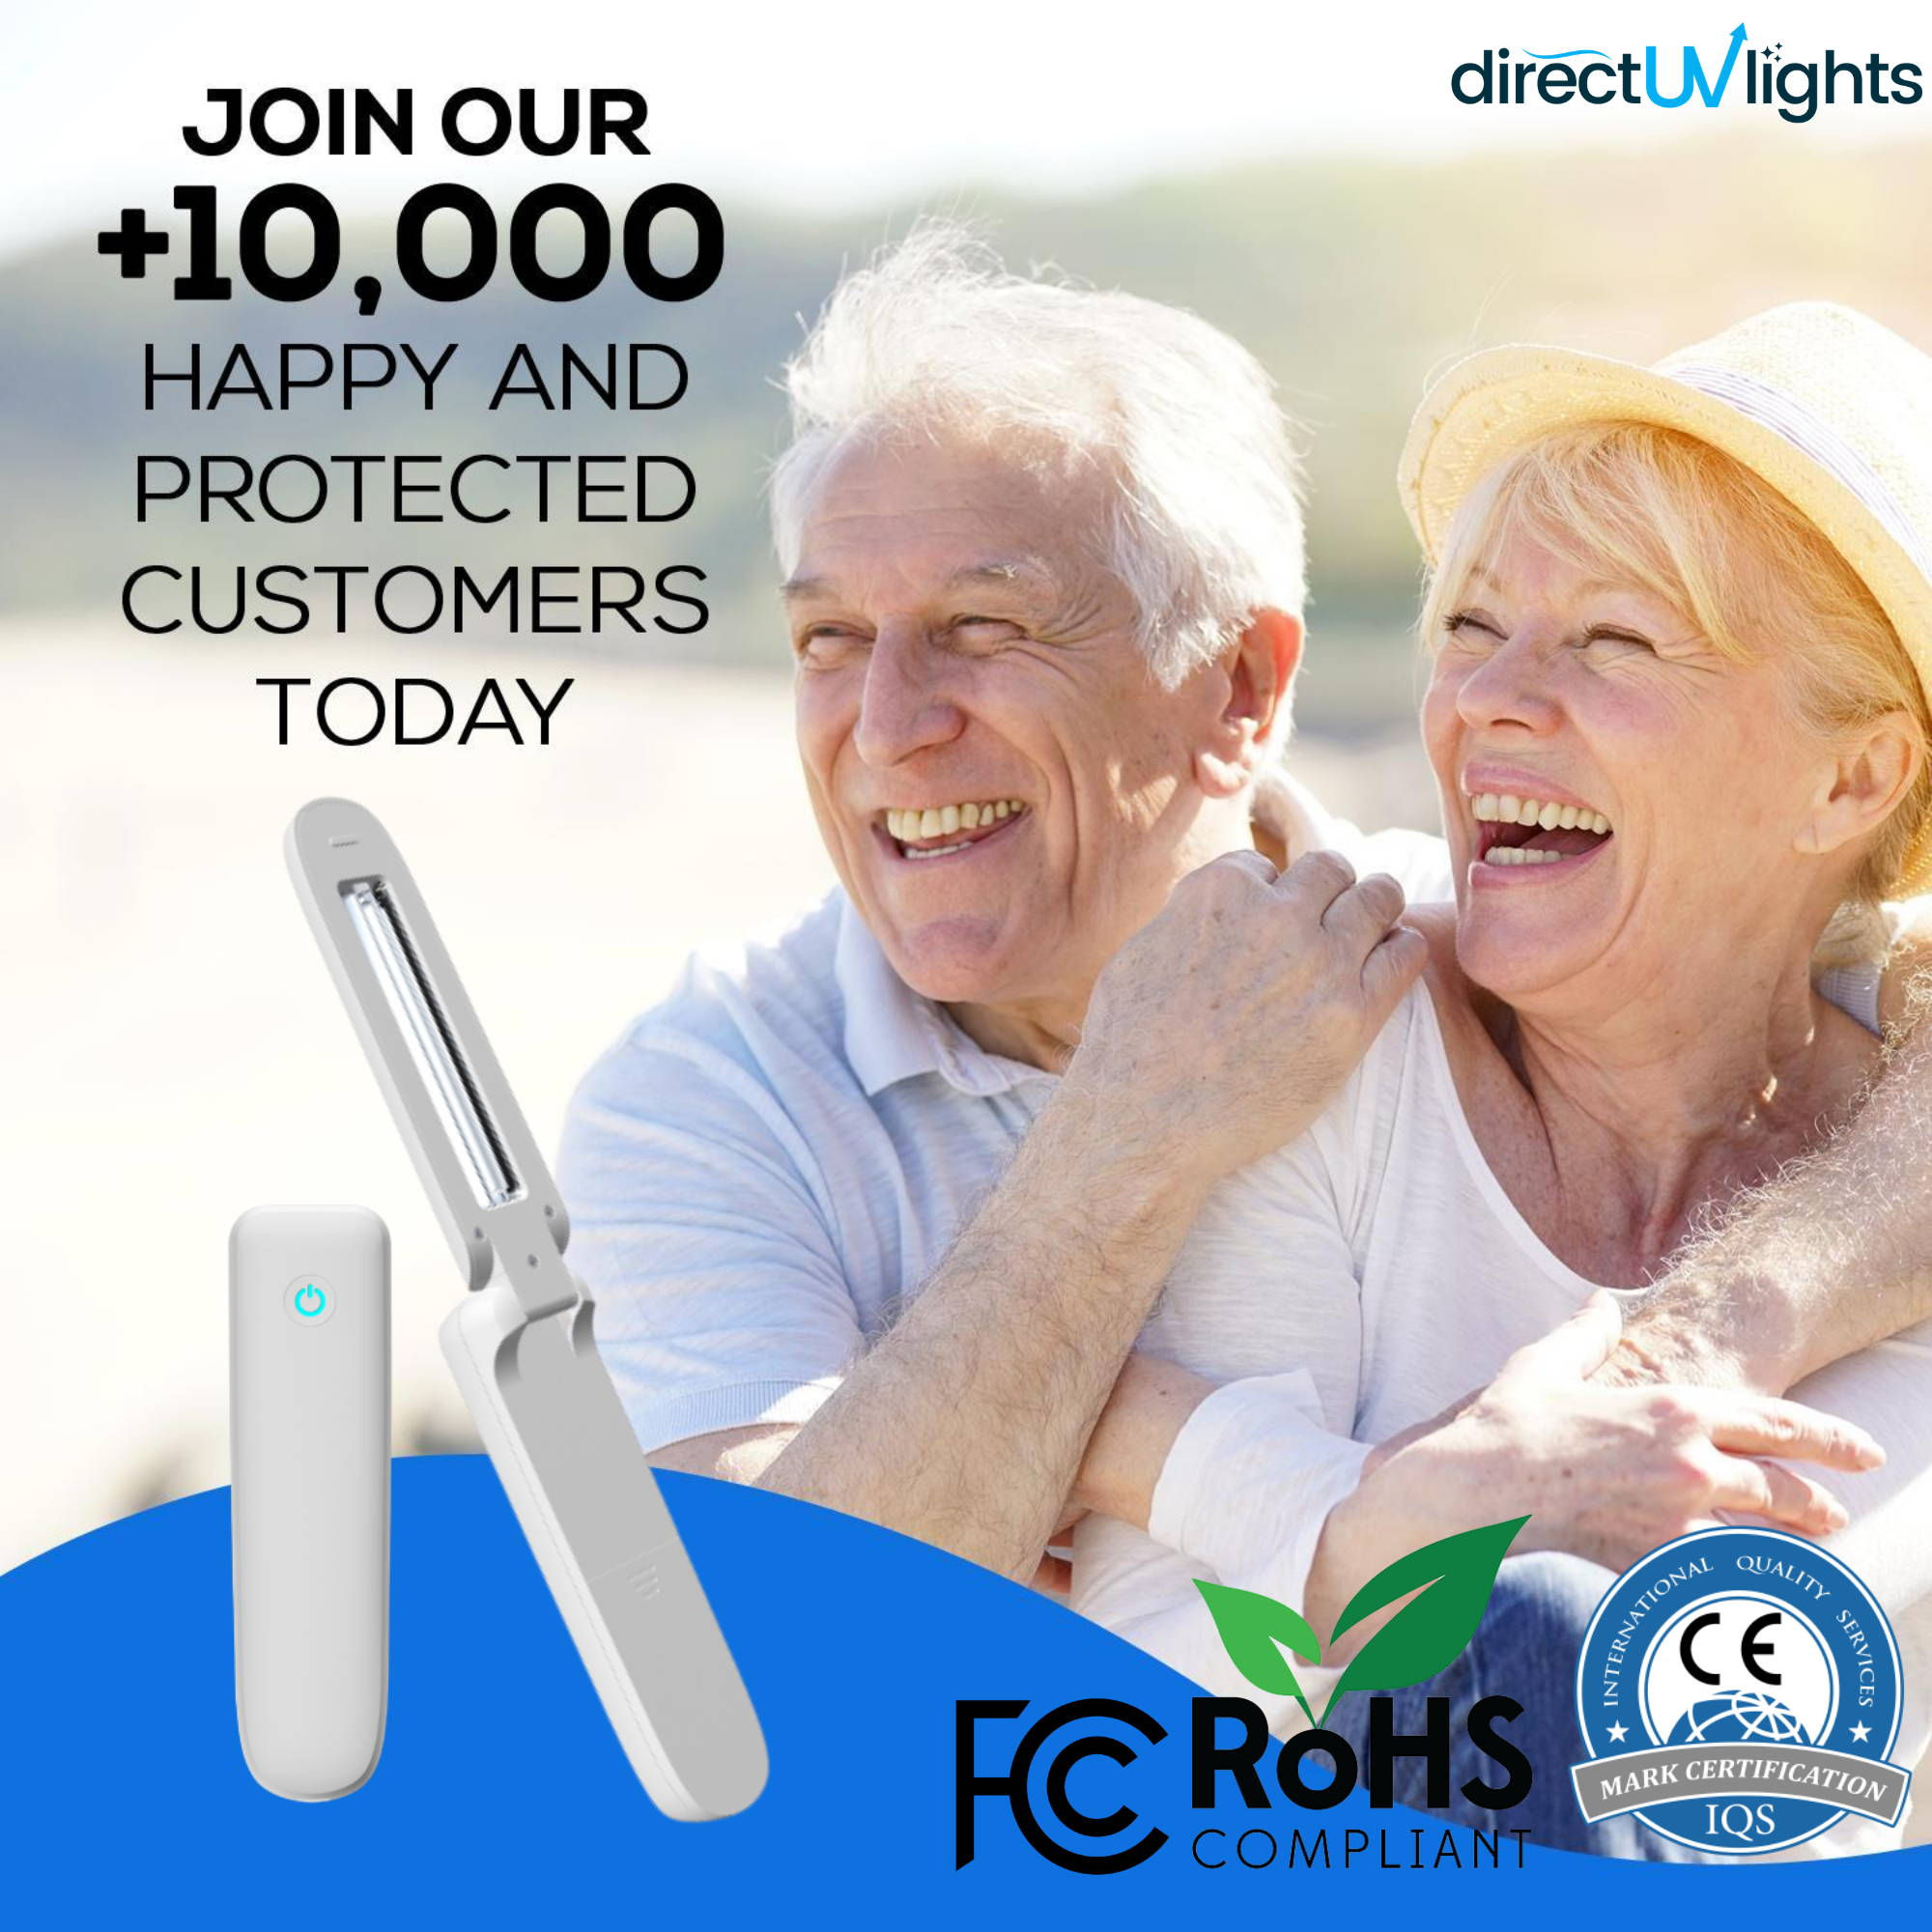 UVC Light Sanitizer, uv c light products, uv handheld sanitizer, uvc handheld unit, ultraviolet wand,